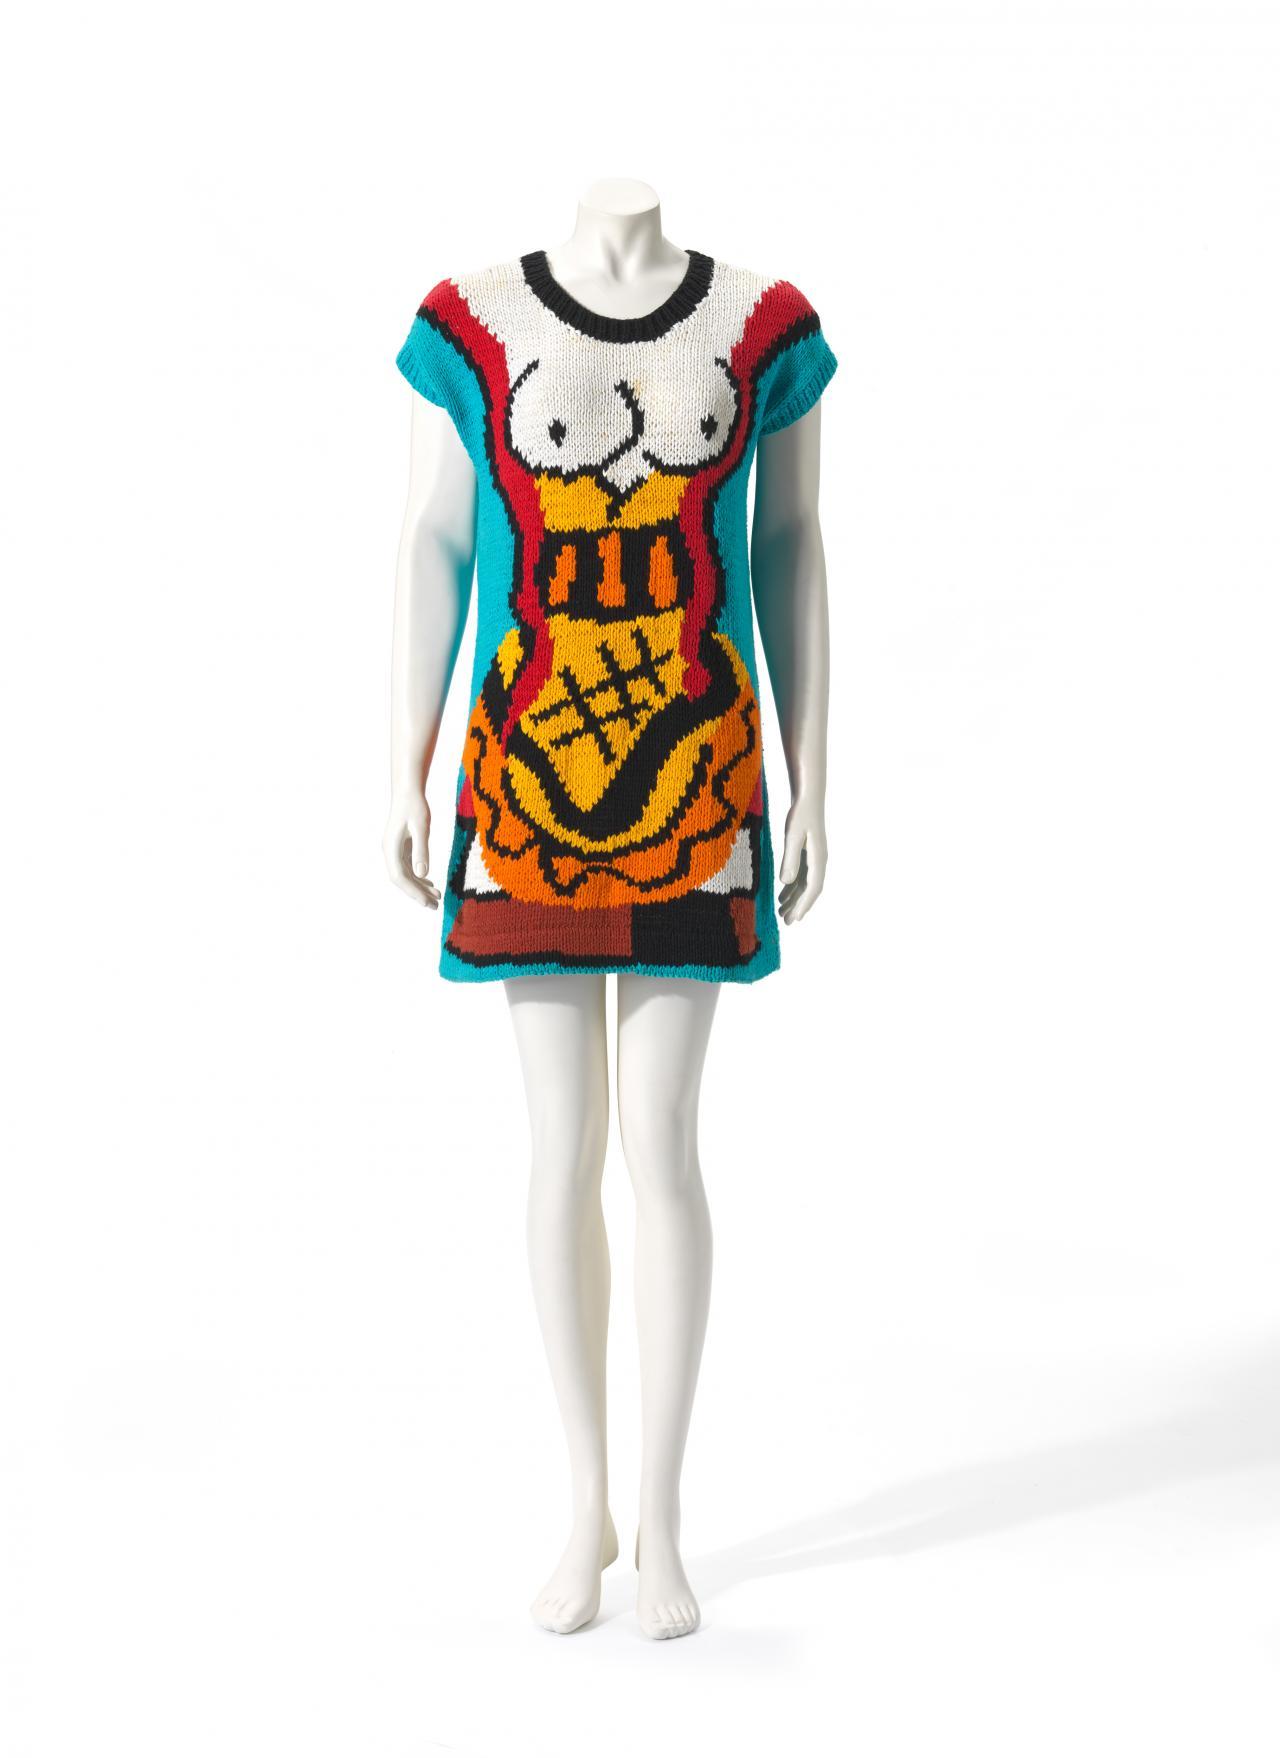 Snake Goddess Flamingo Park Sydney Fashion House Jenny Kee Designer Jan Ayres Knitter Ngv View Work